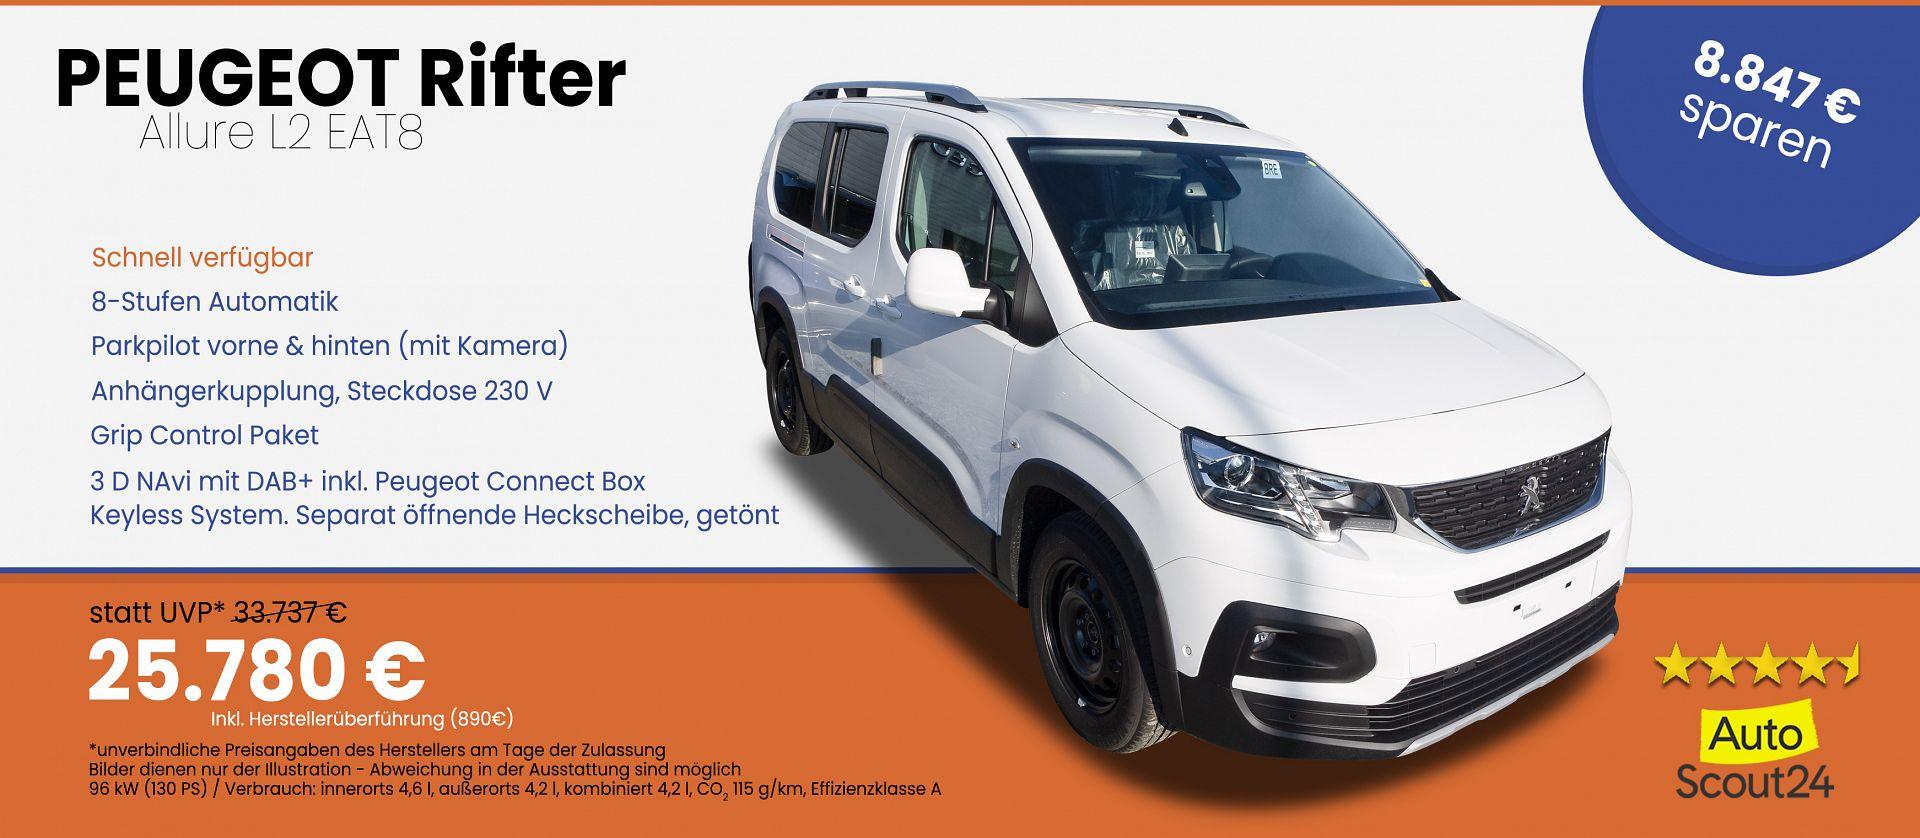 Peugeot Rifter Allure L2 BlueHDI 130 EAT8 Automatik